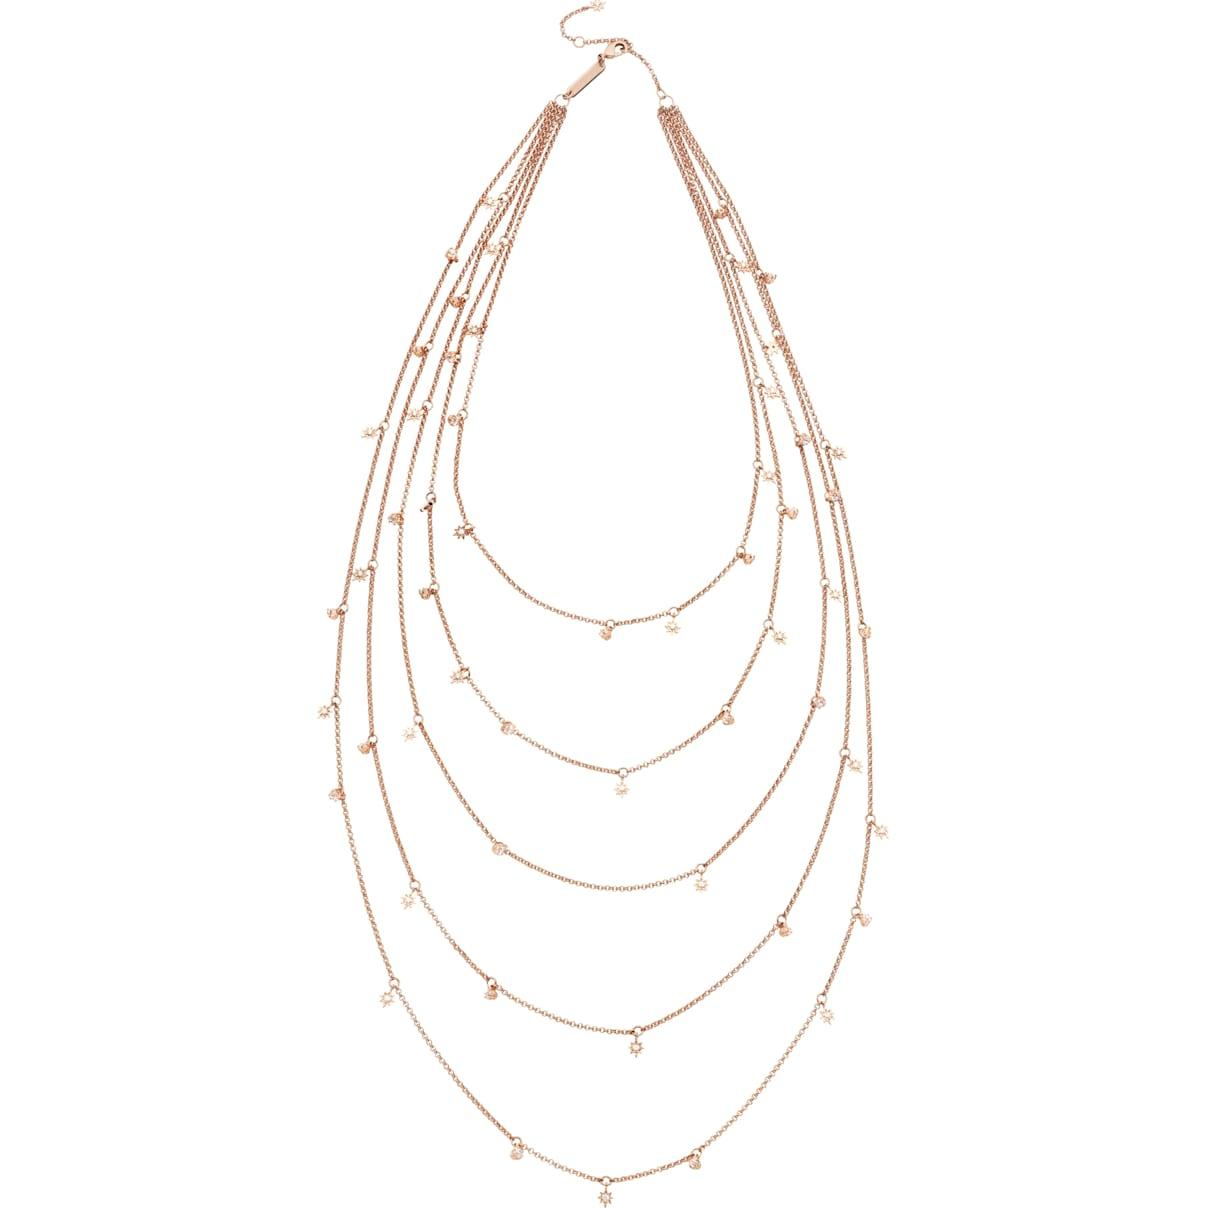 Swarovski Penélope Cruz Moonsun Multi Strandage, Limited Edition, White, Rose-gold tone plated